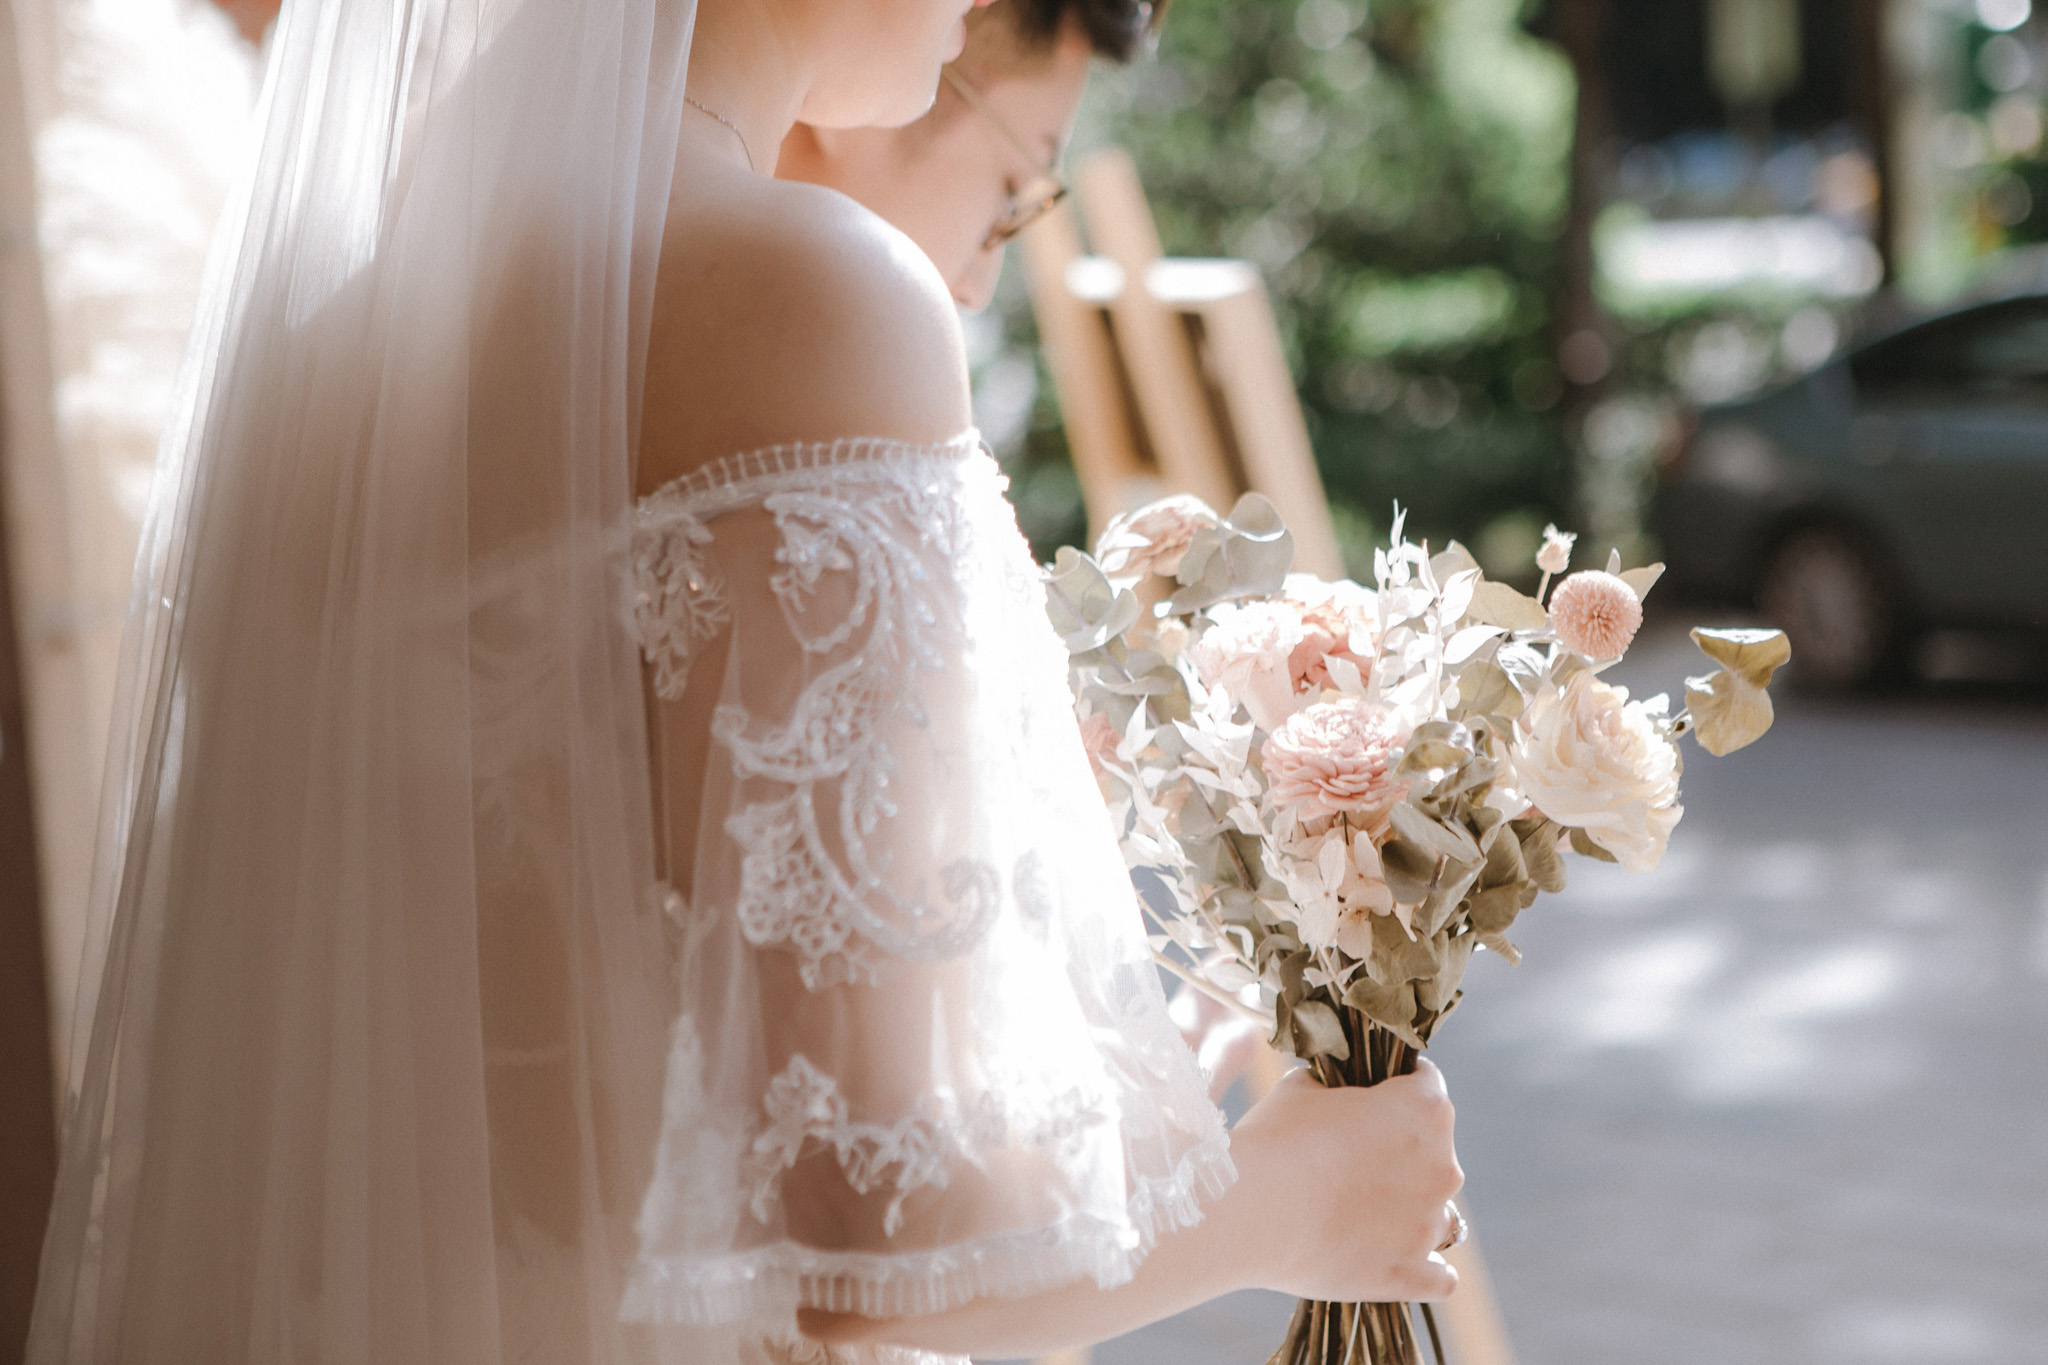 EW 台北婚攝 居米 濟南教會 Brick Yard 33 美軍俱樂部 婚禮 婚宴-51